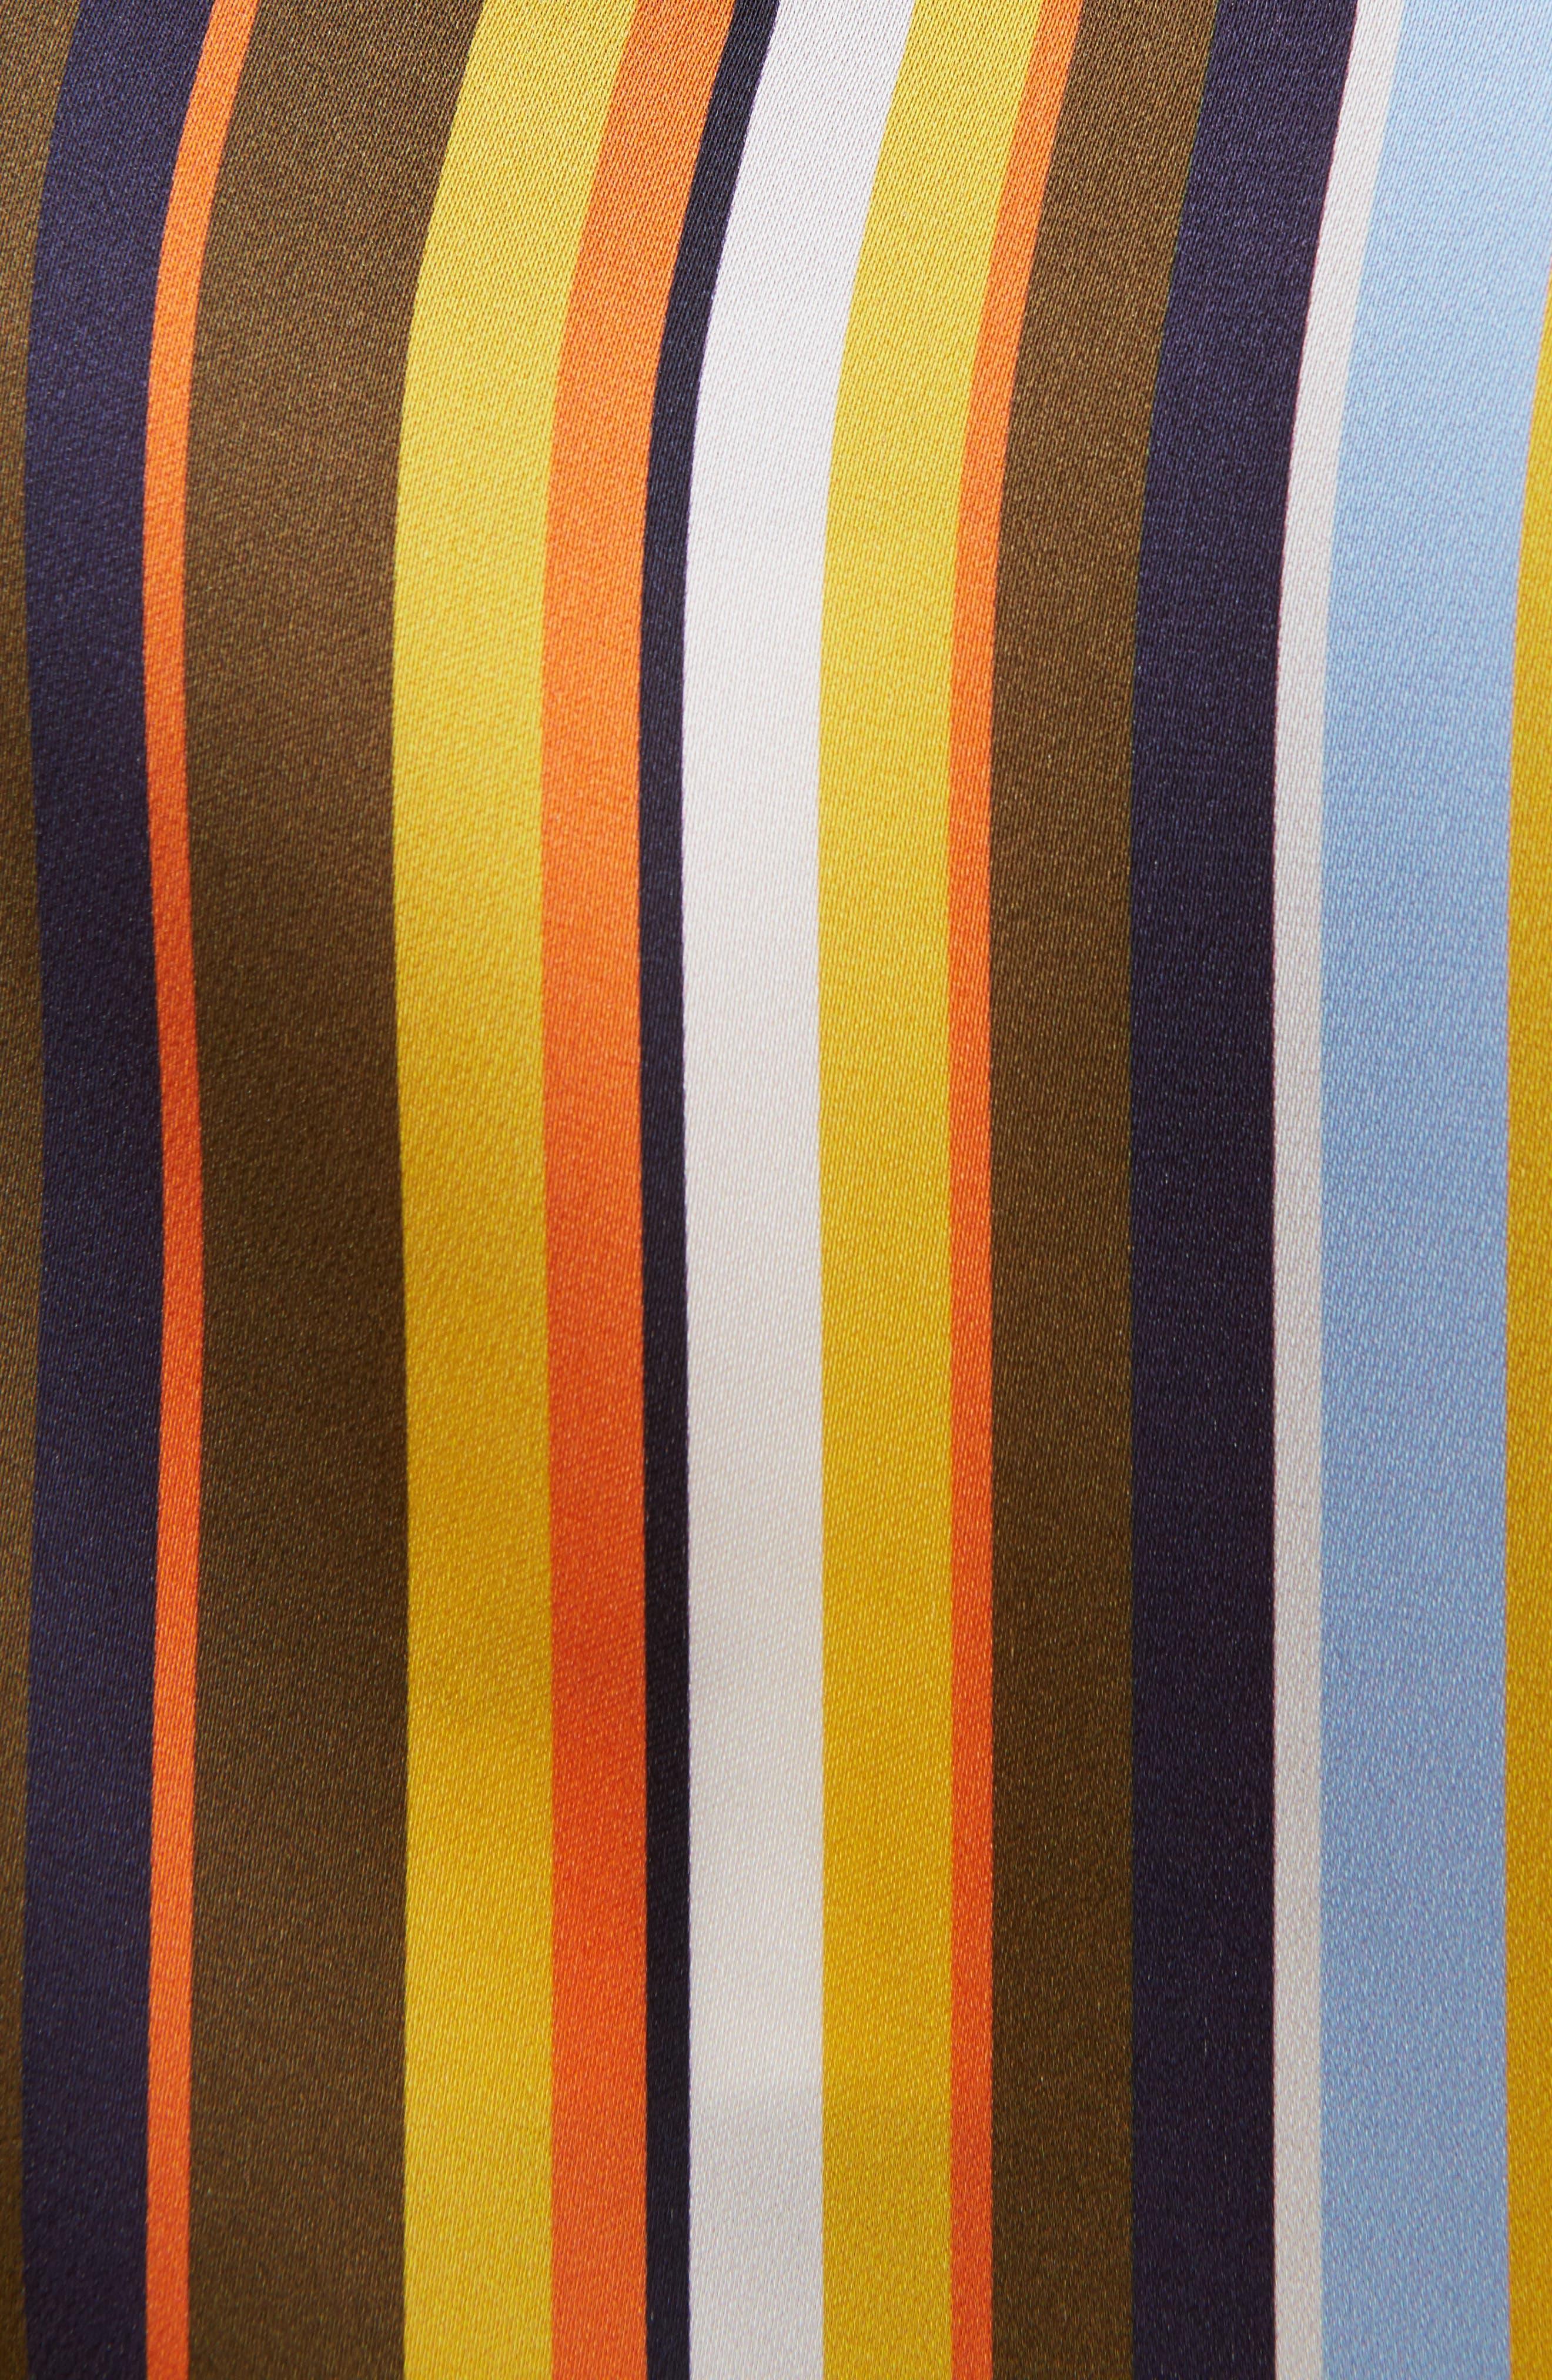 Buse Multistripe Blouse,                             Alternate thumbnail 5, color,                             700